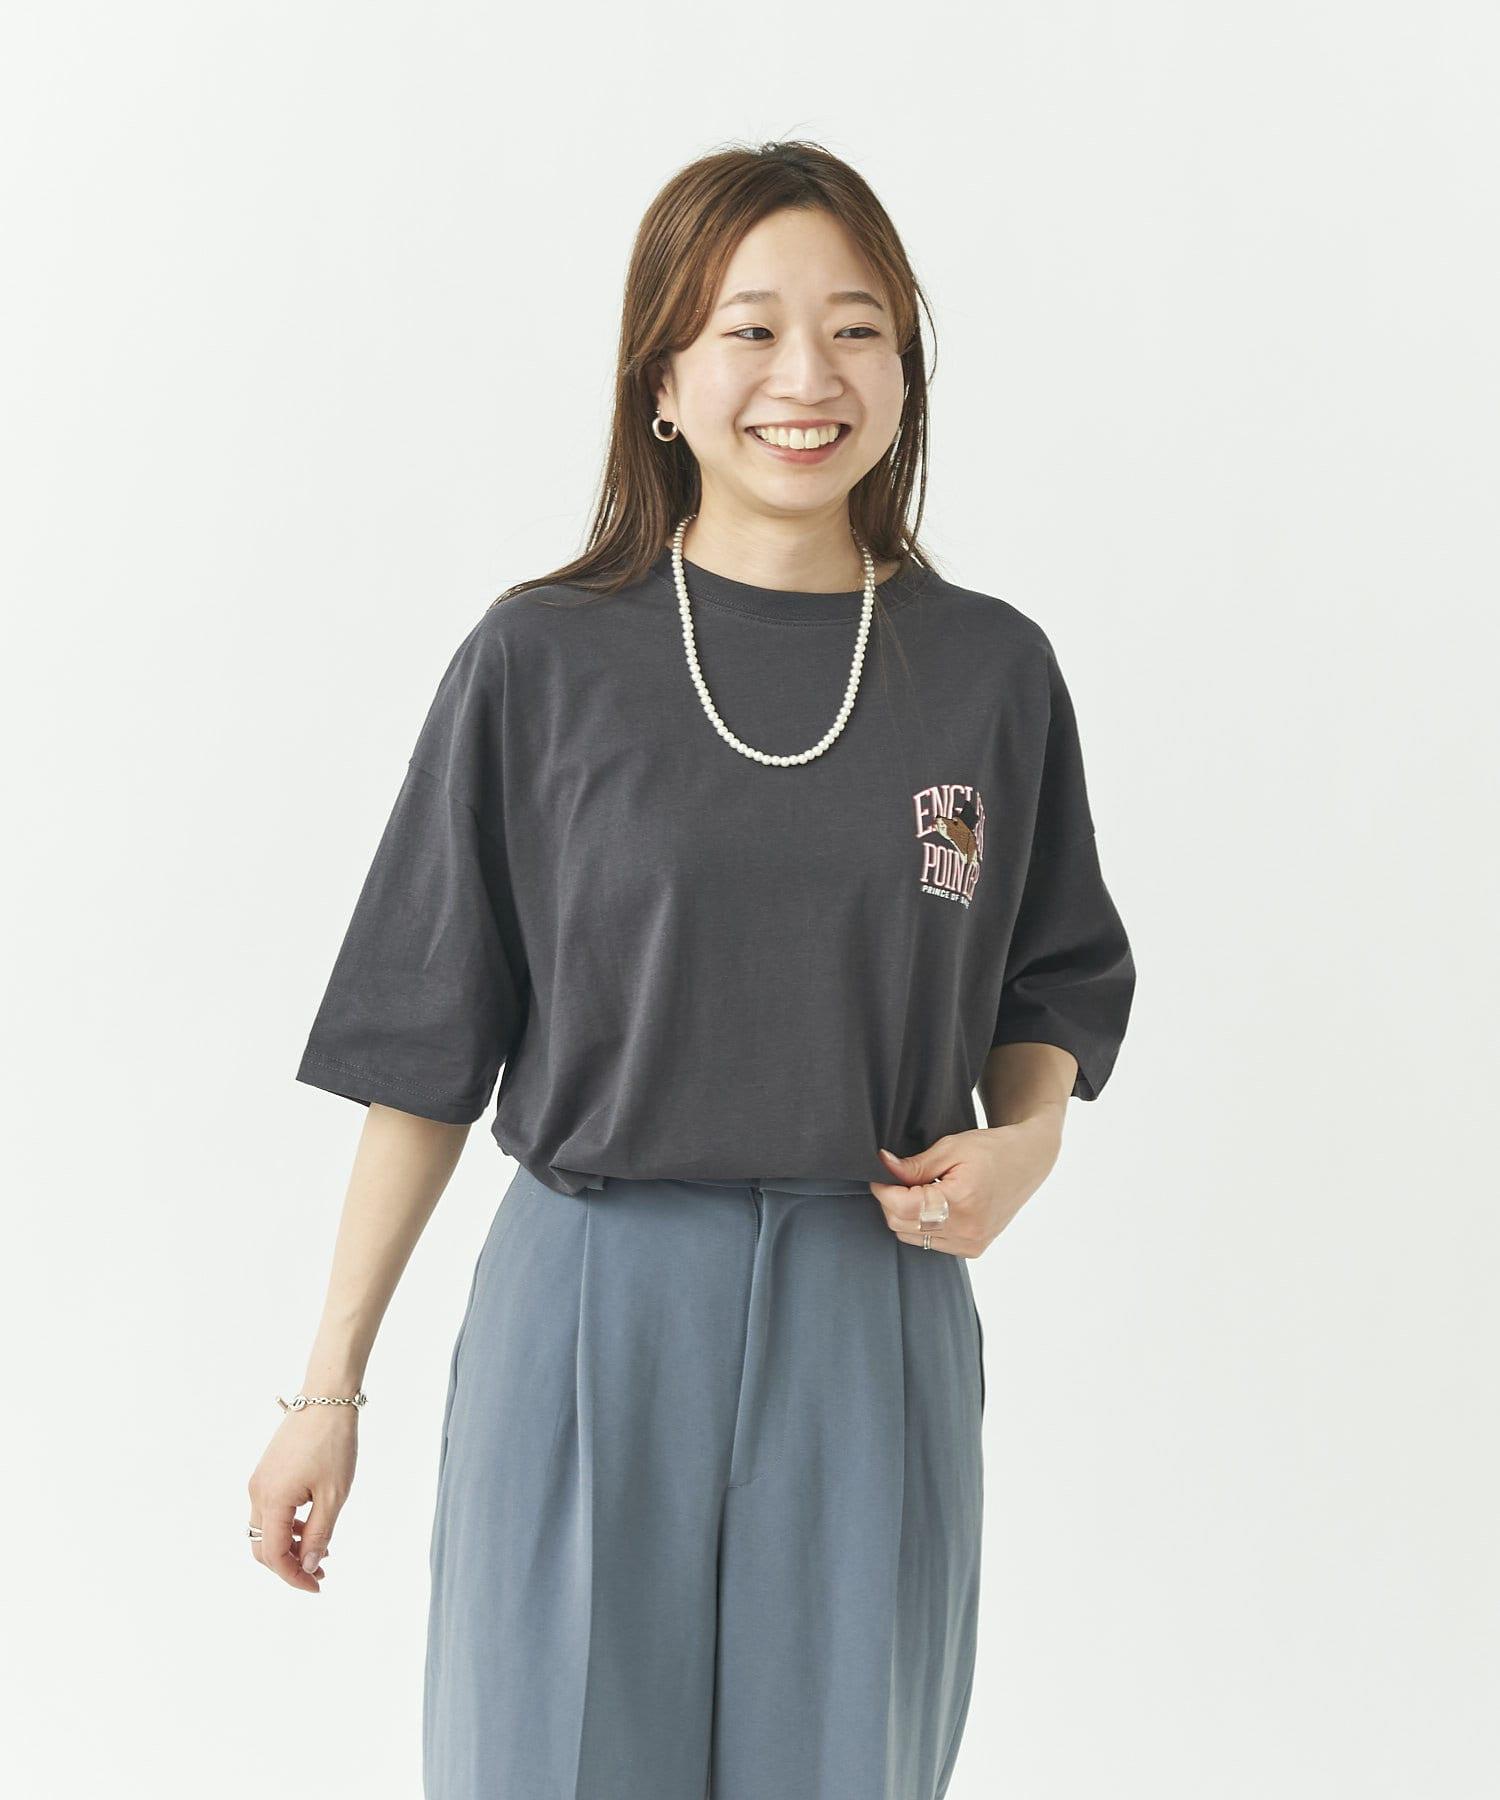 CPCM(シーピーシーエム) カレッジ犬刺繍T